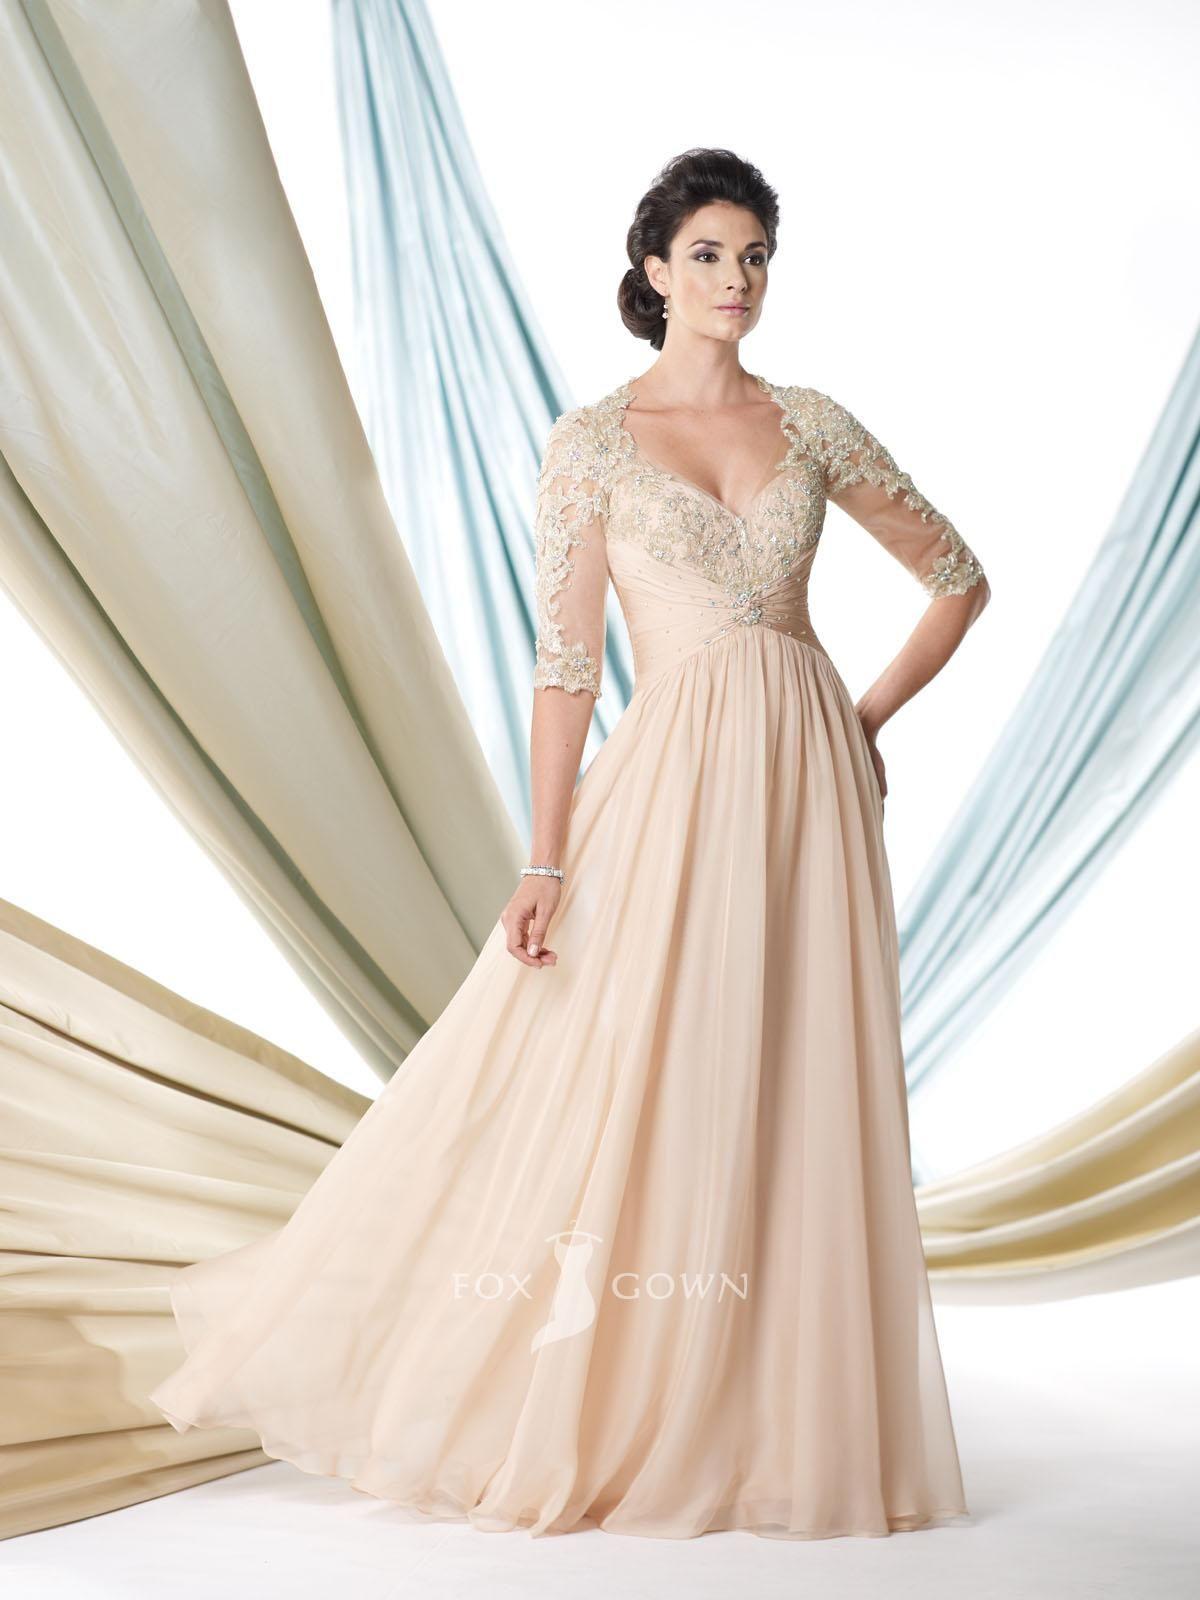 Motherus dress may pinterest queen anne bride